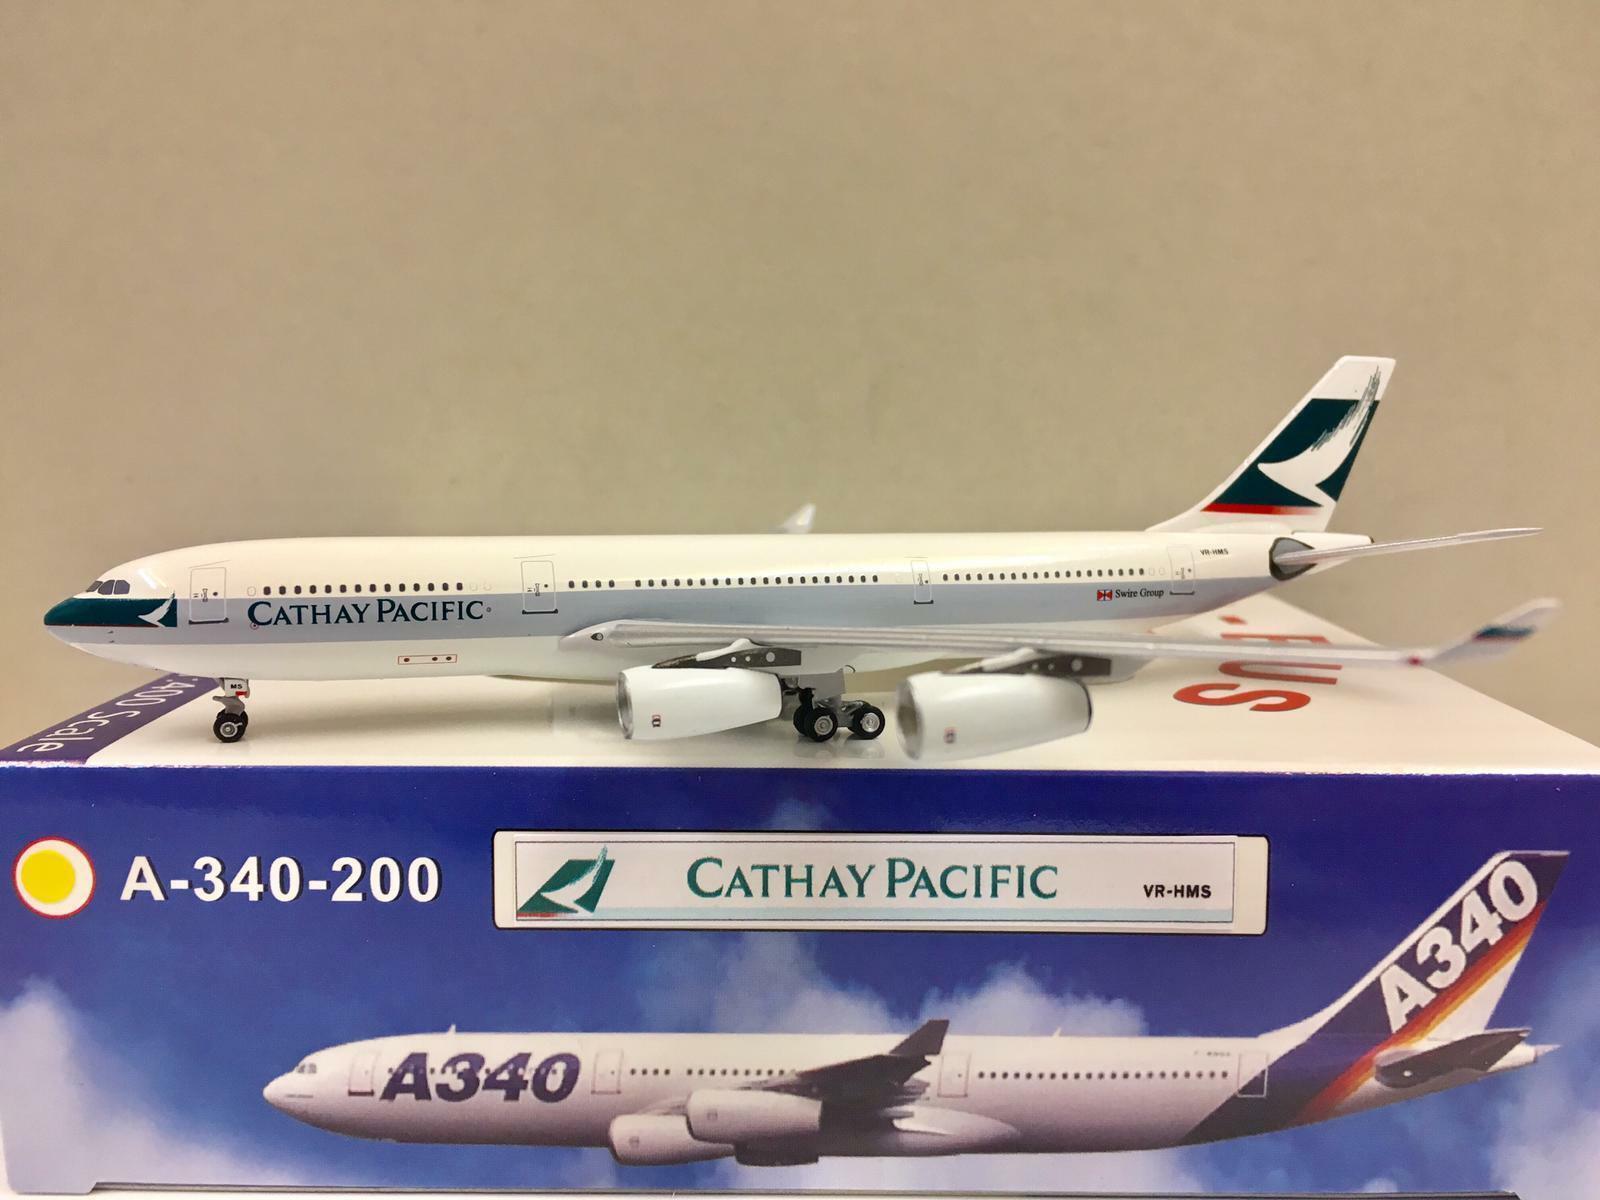 Aeroclassics 1 400 Cathay Pacific A340-200 VR-HMS